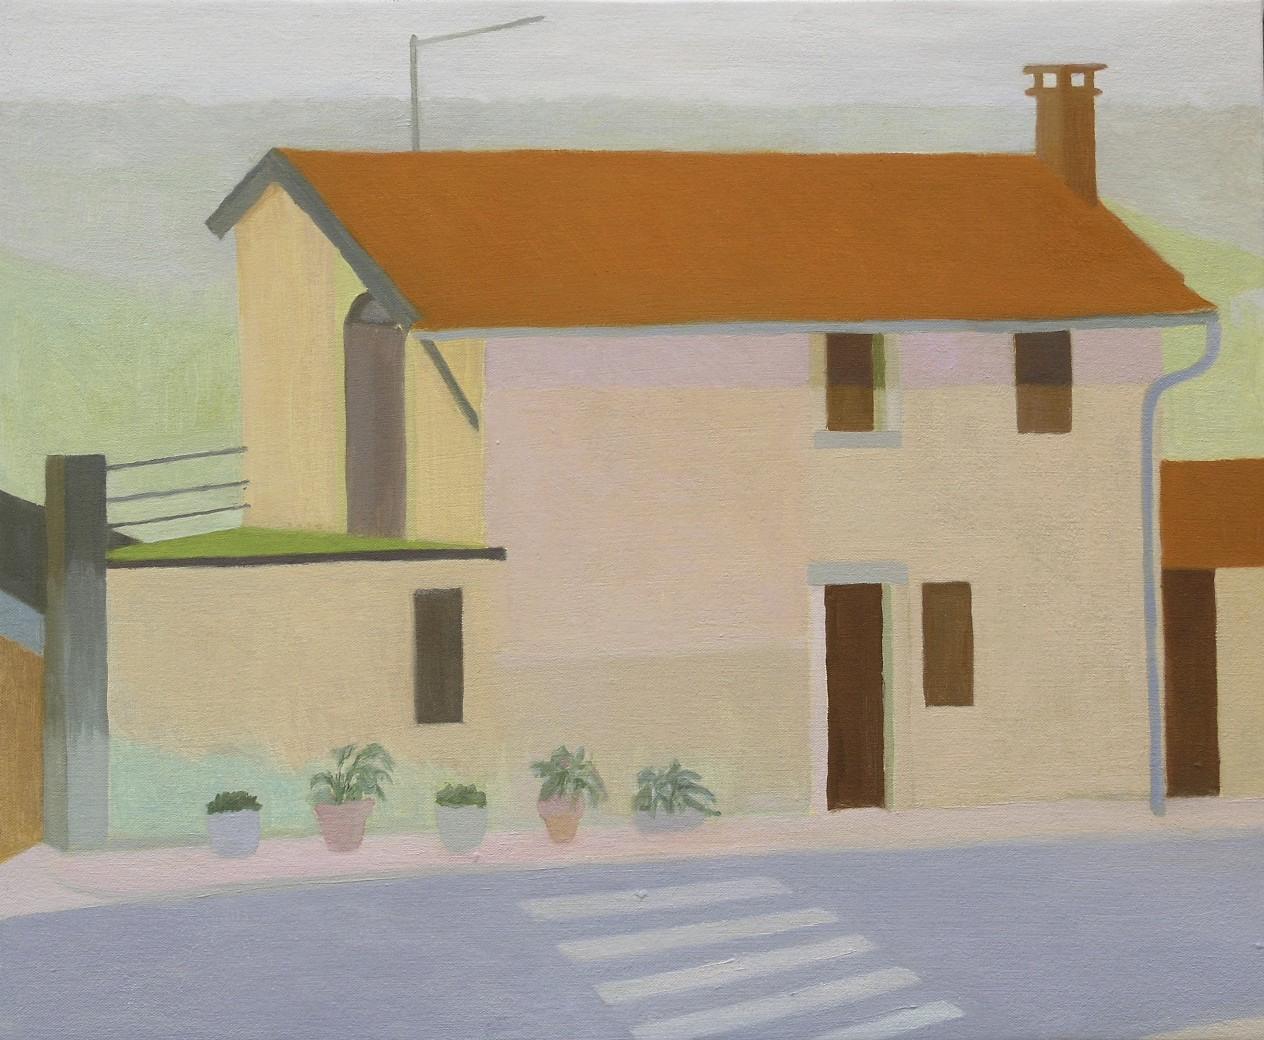 Postman's house 5